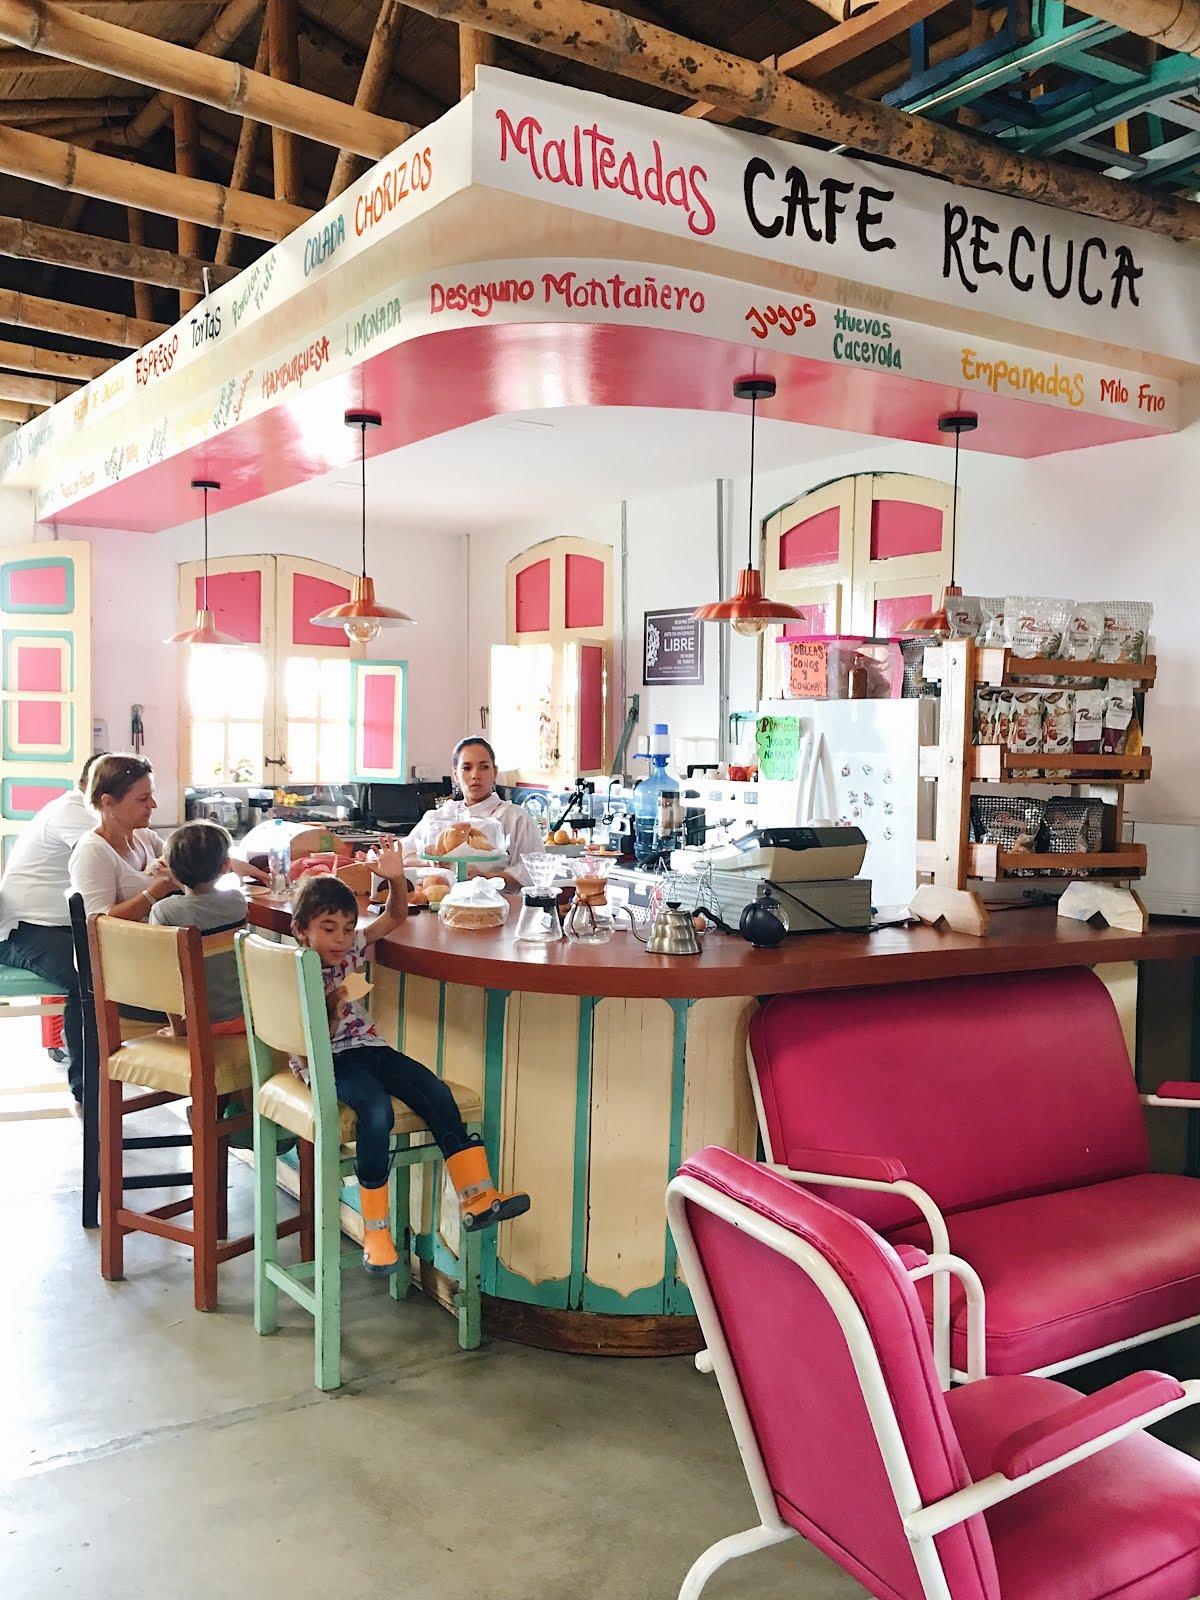 recuca restaurant, colombian restaurants, recuca colombia, coffee tour colombia